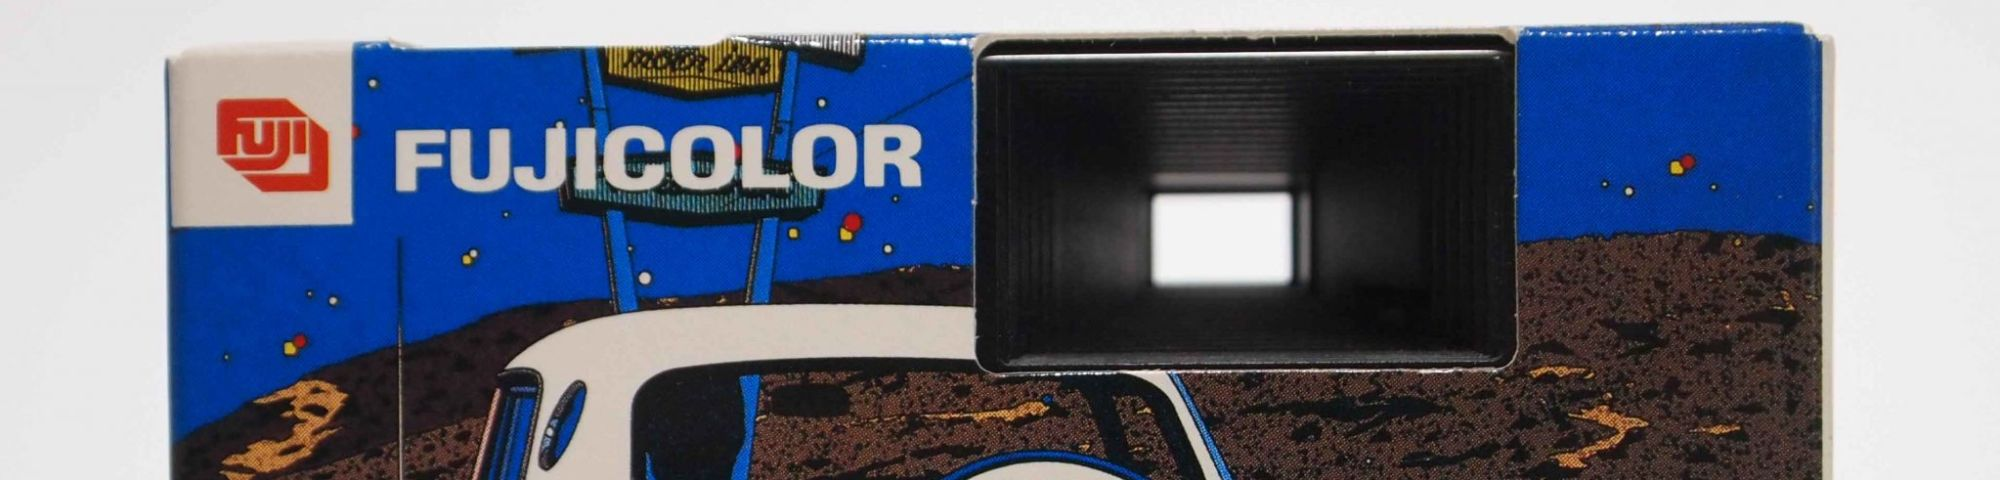 Fujicolour-Super-HR-24-Frames-200-Rob-Kesseler-1